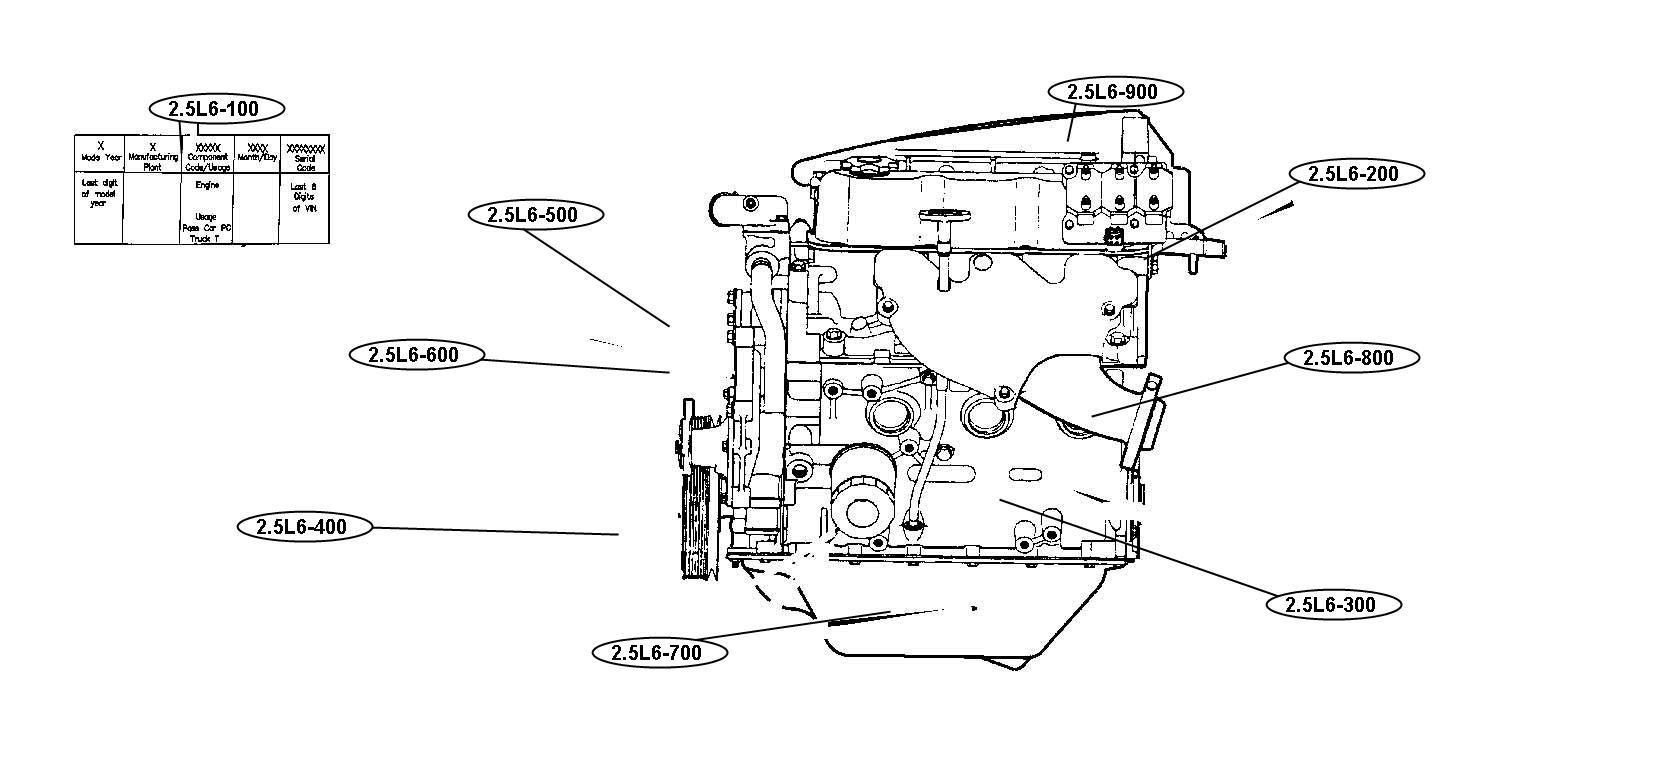 Jeep Wrangler Canister. Vapor. Evap, emissionsemissions